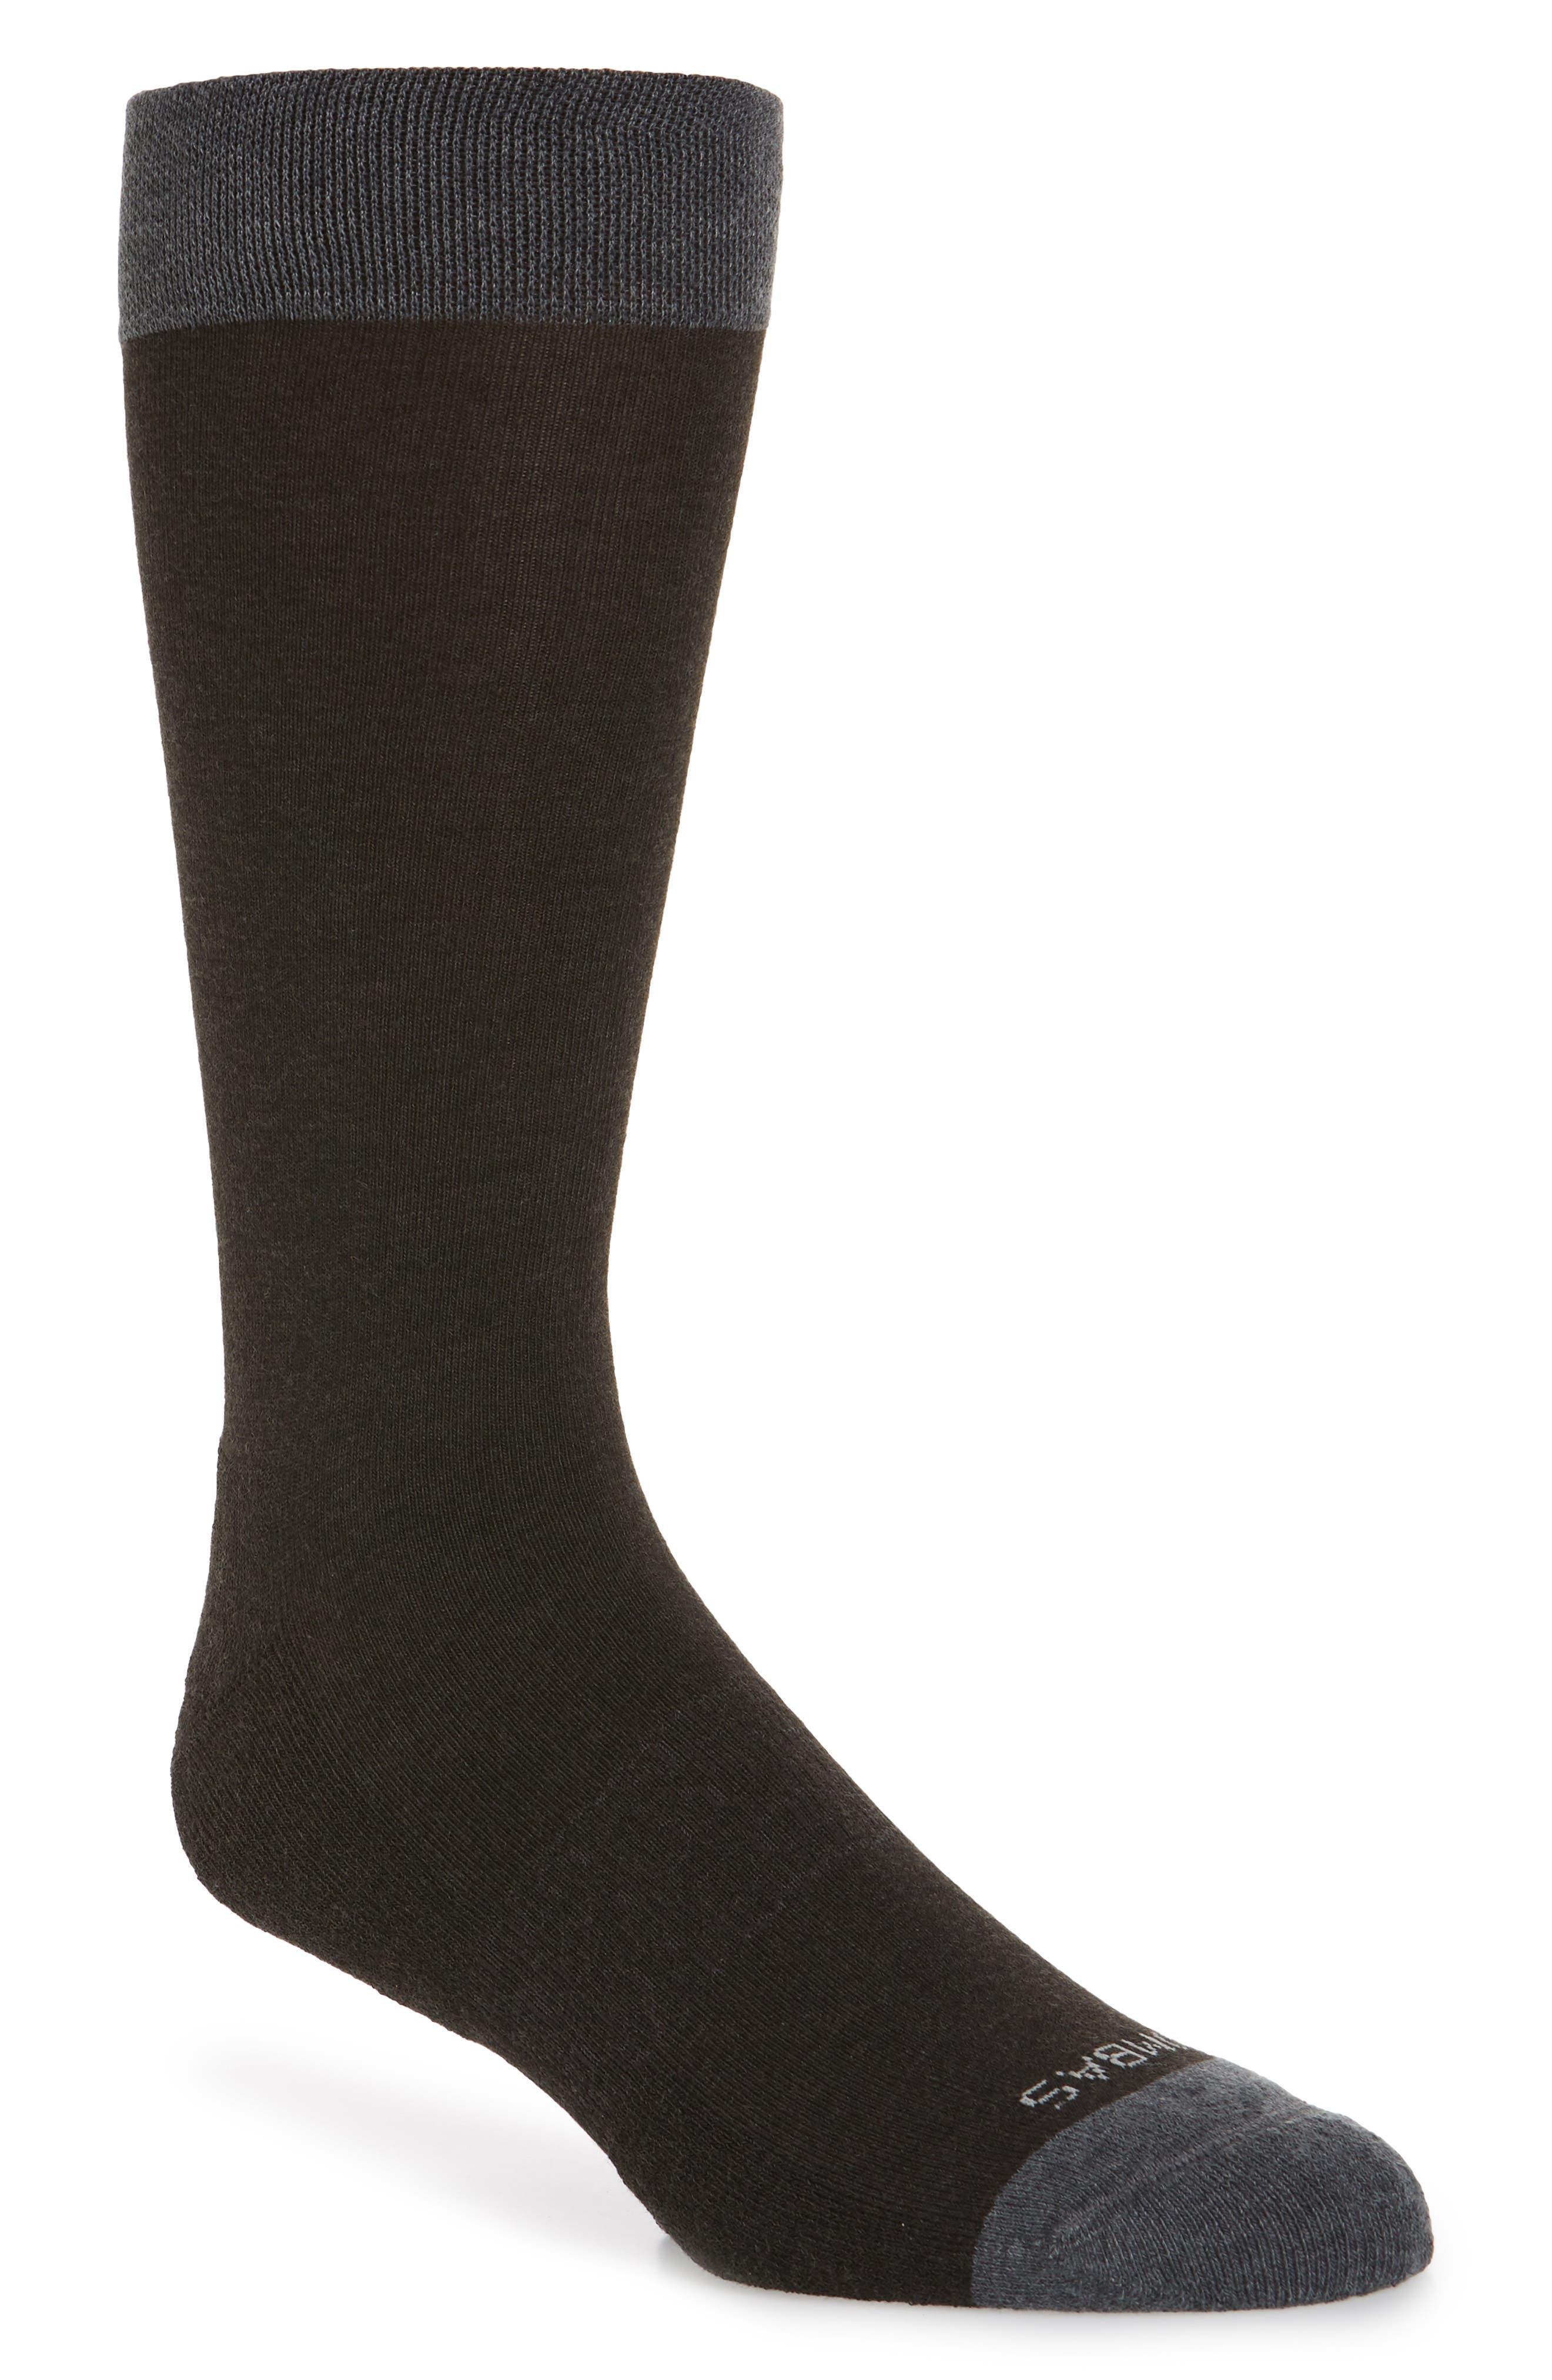 Solid Dress Socks,                             Main thumbnail 1, color,                             CHARCOAL